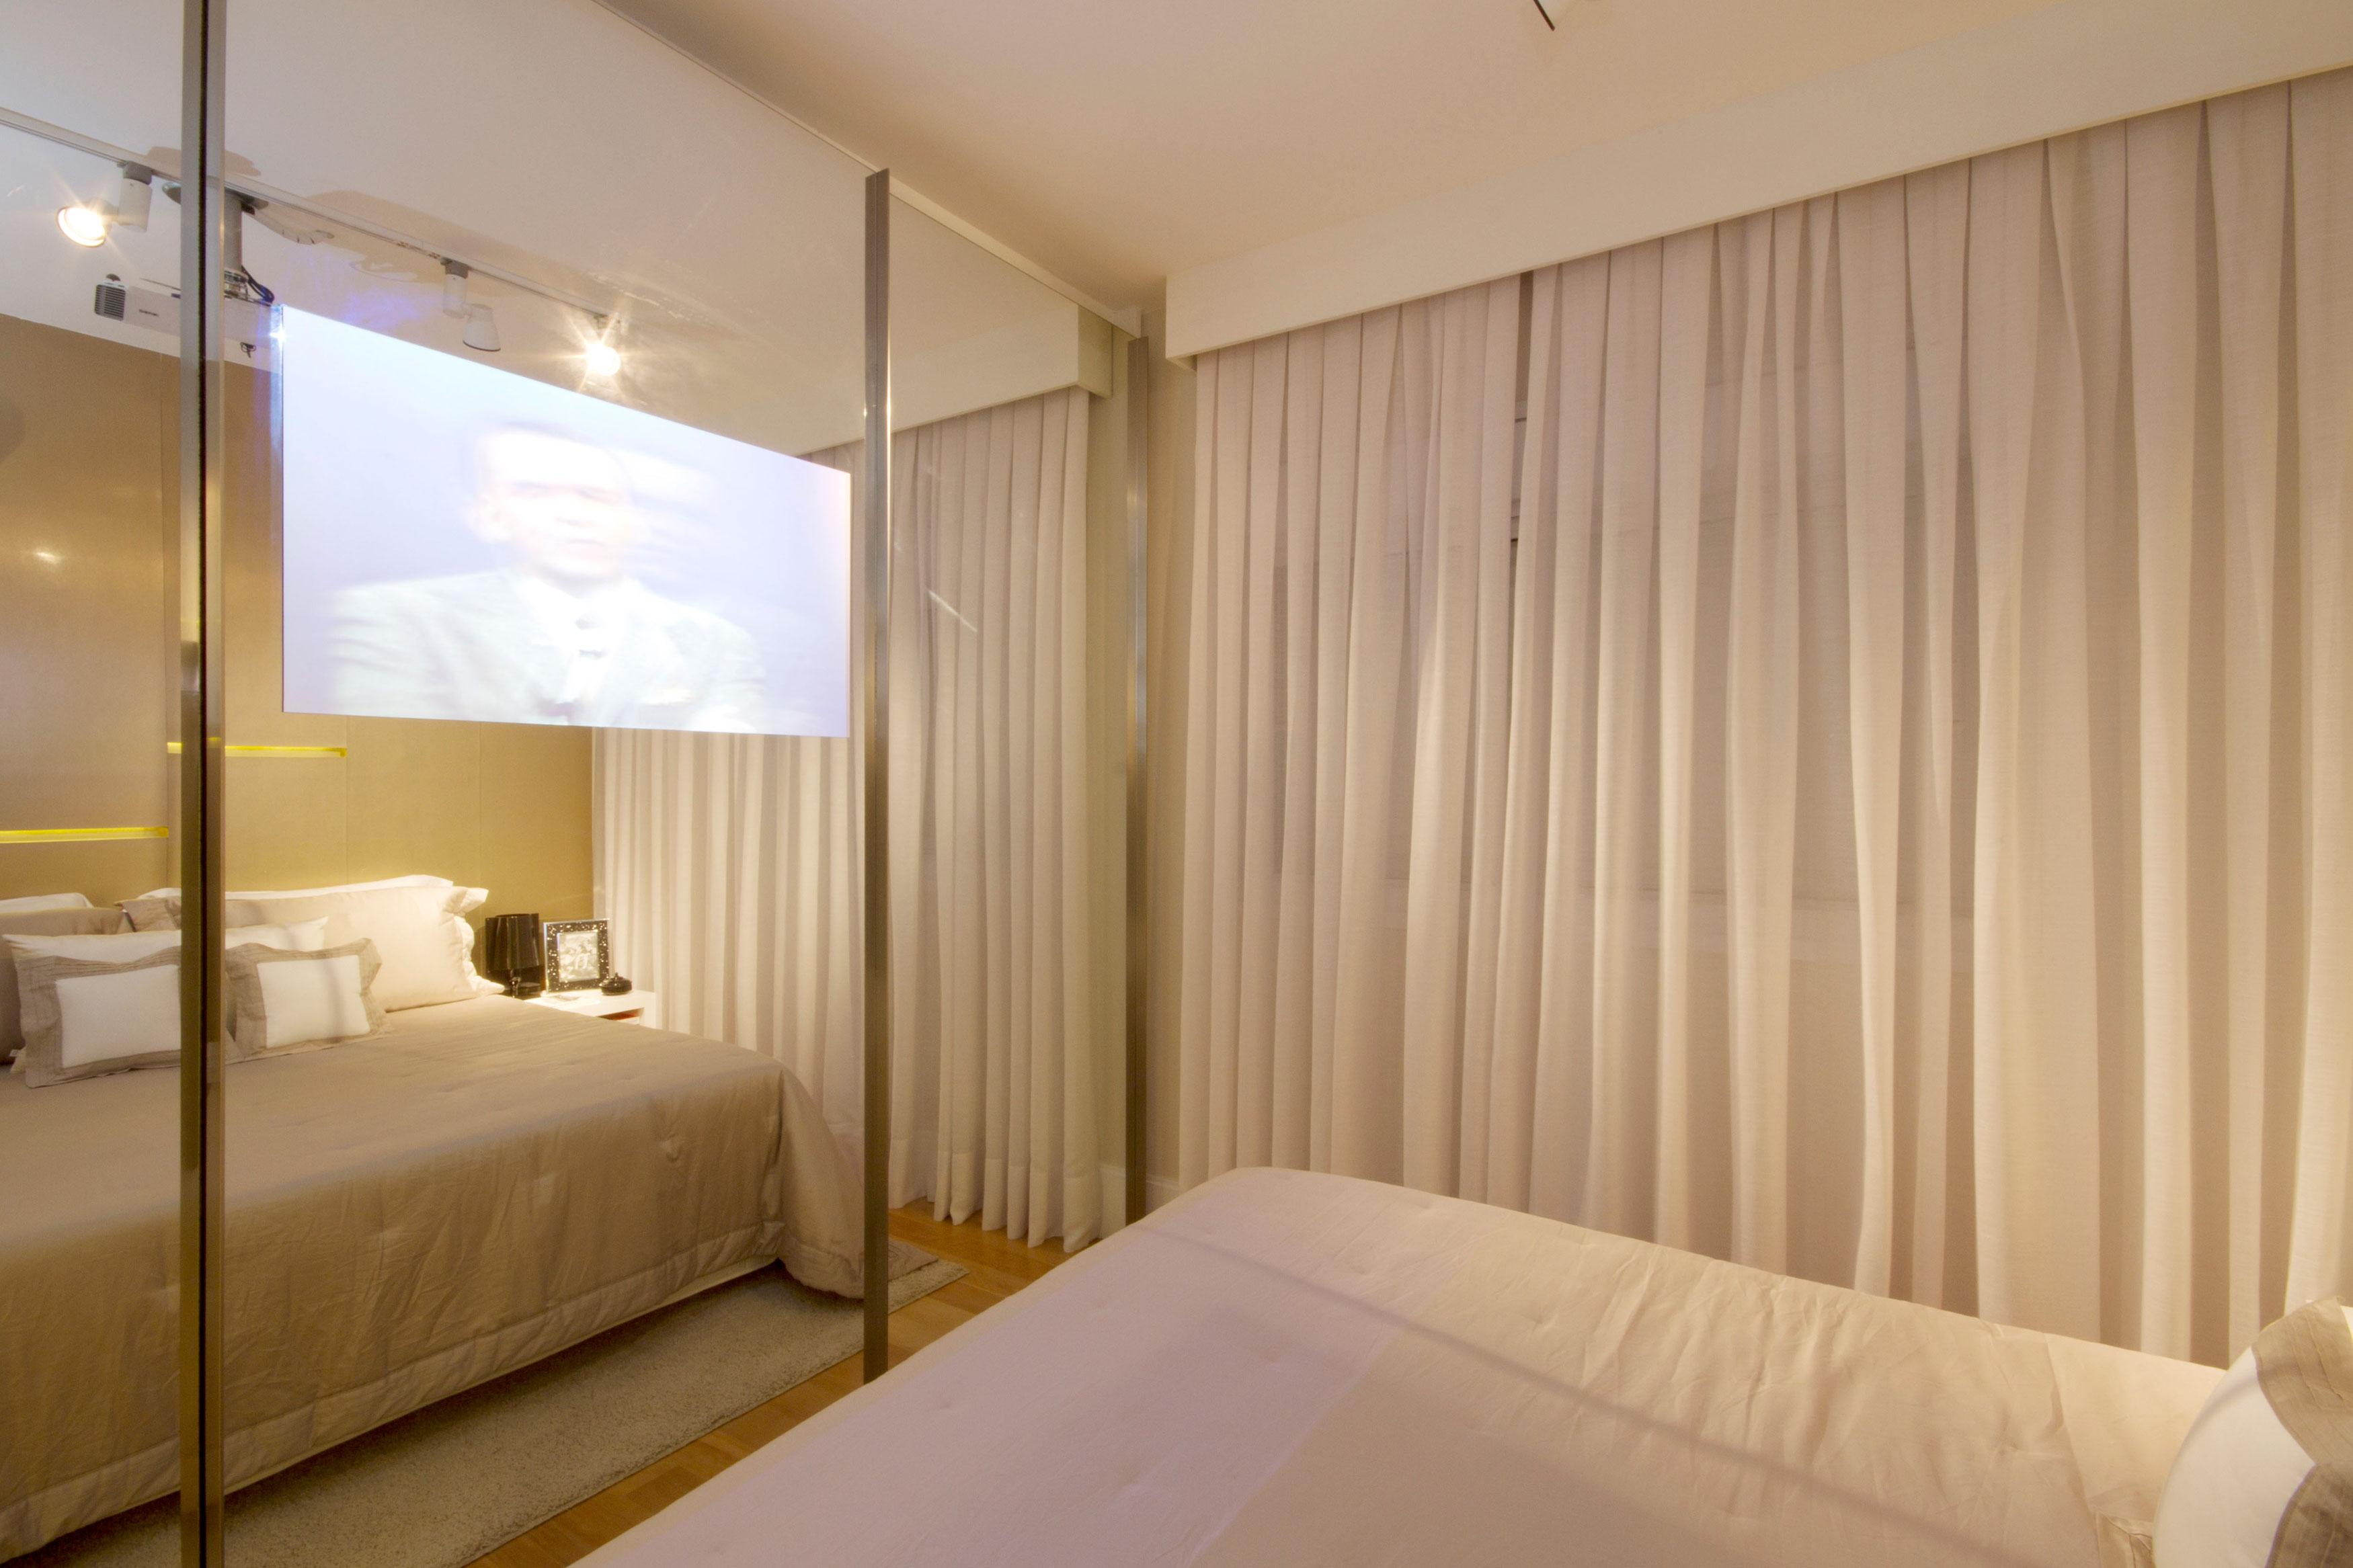 108 m² - Suíte do casal